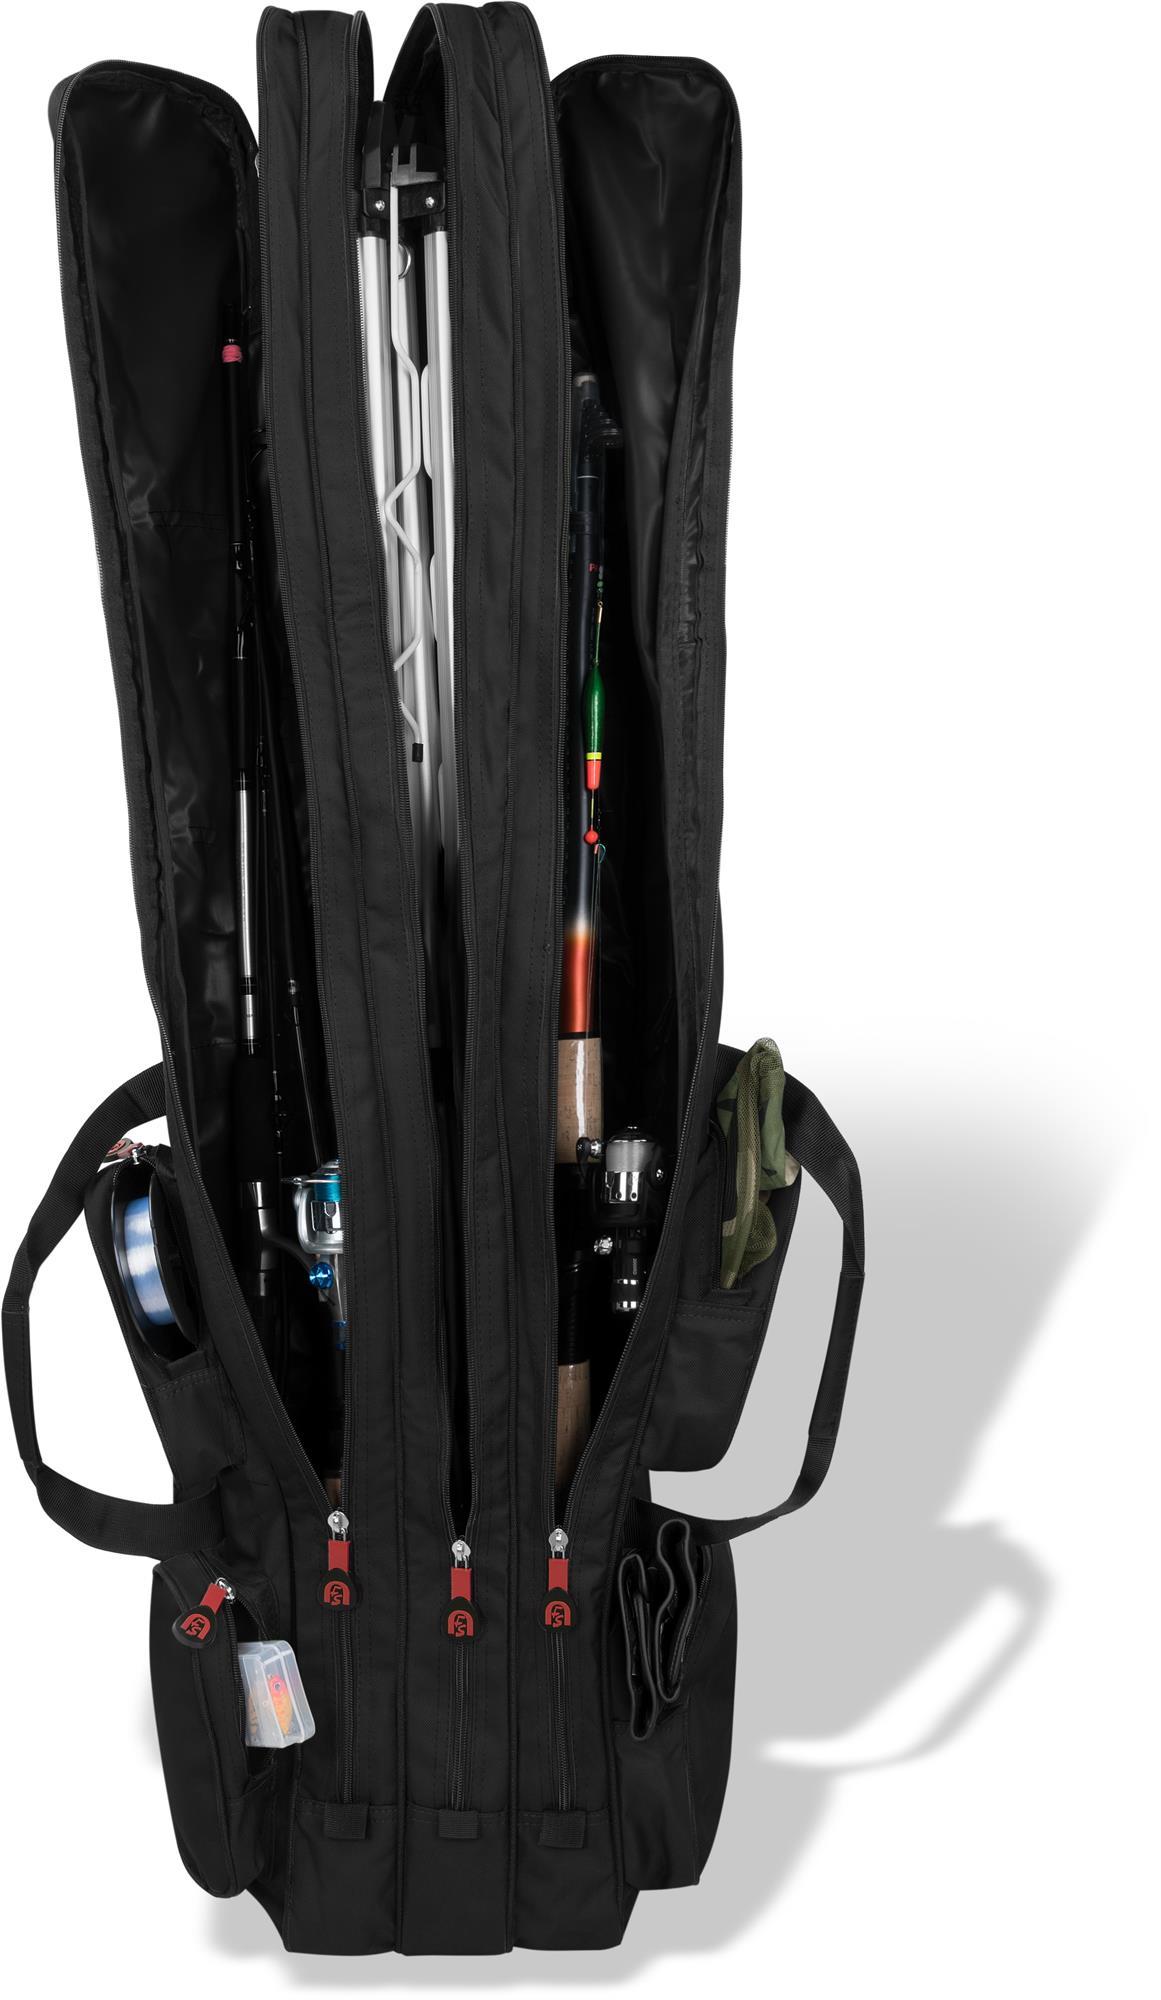 3 Kammern für 6 Ruten Rutenrucksack Angeltasche Rutentasche Rutenfutteral 160cm